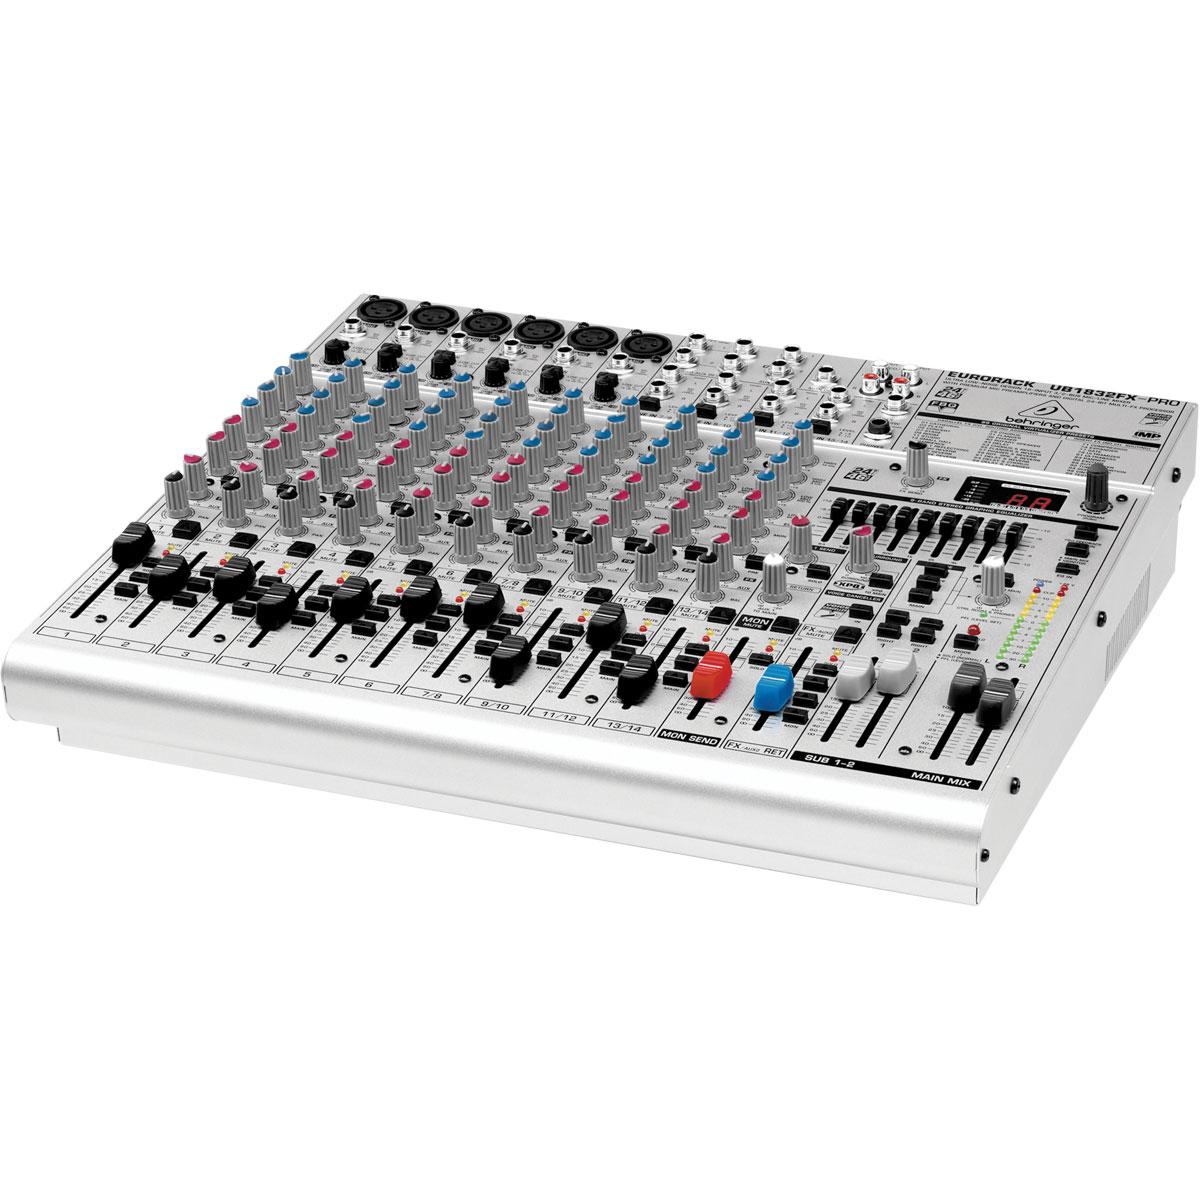 UB1832FXPRO - Mesa de Som / Mixer 18 Canais Eurorack UB 1832 FX PRO - Behringer